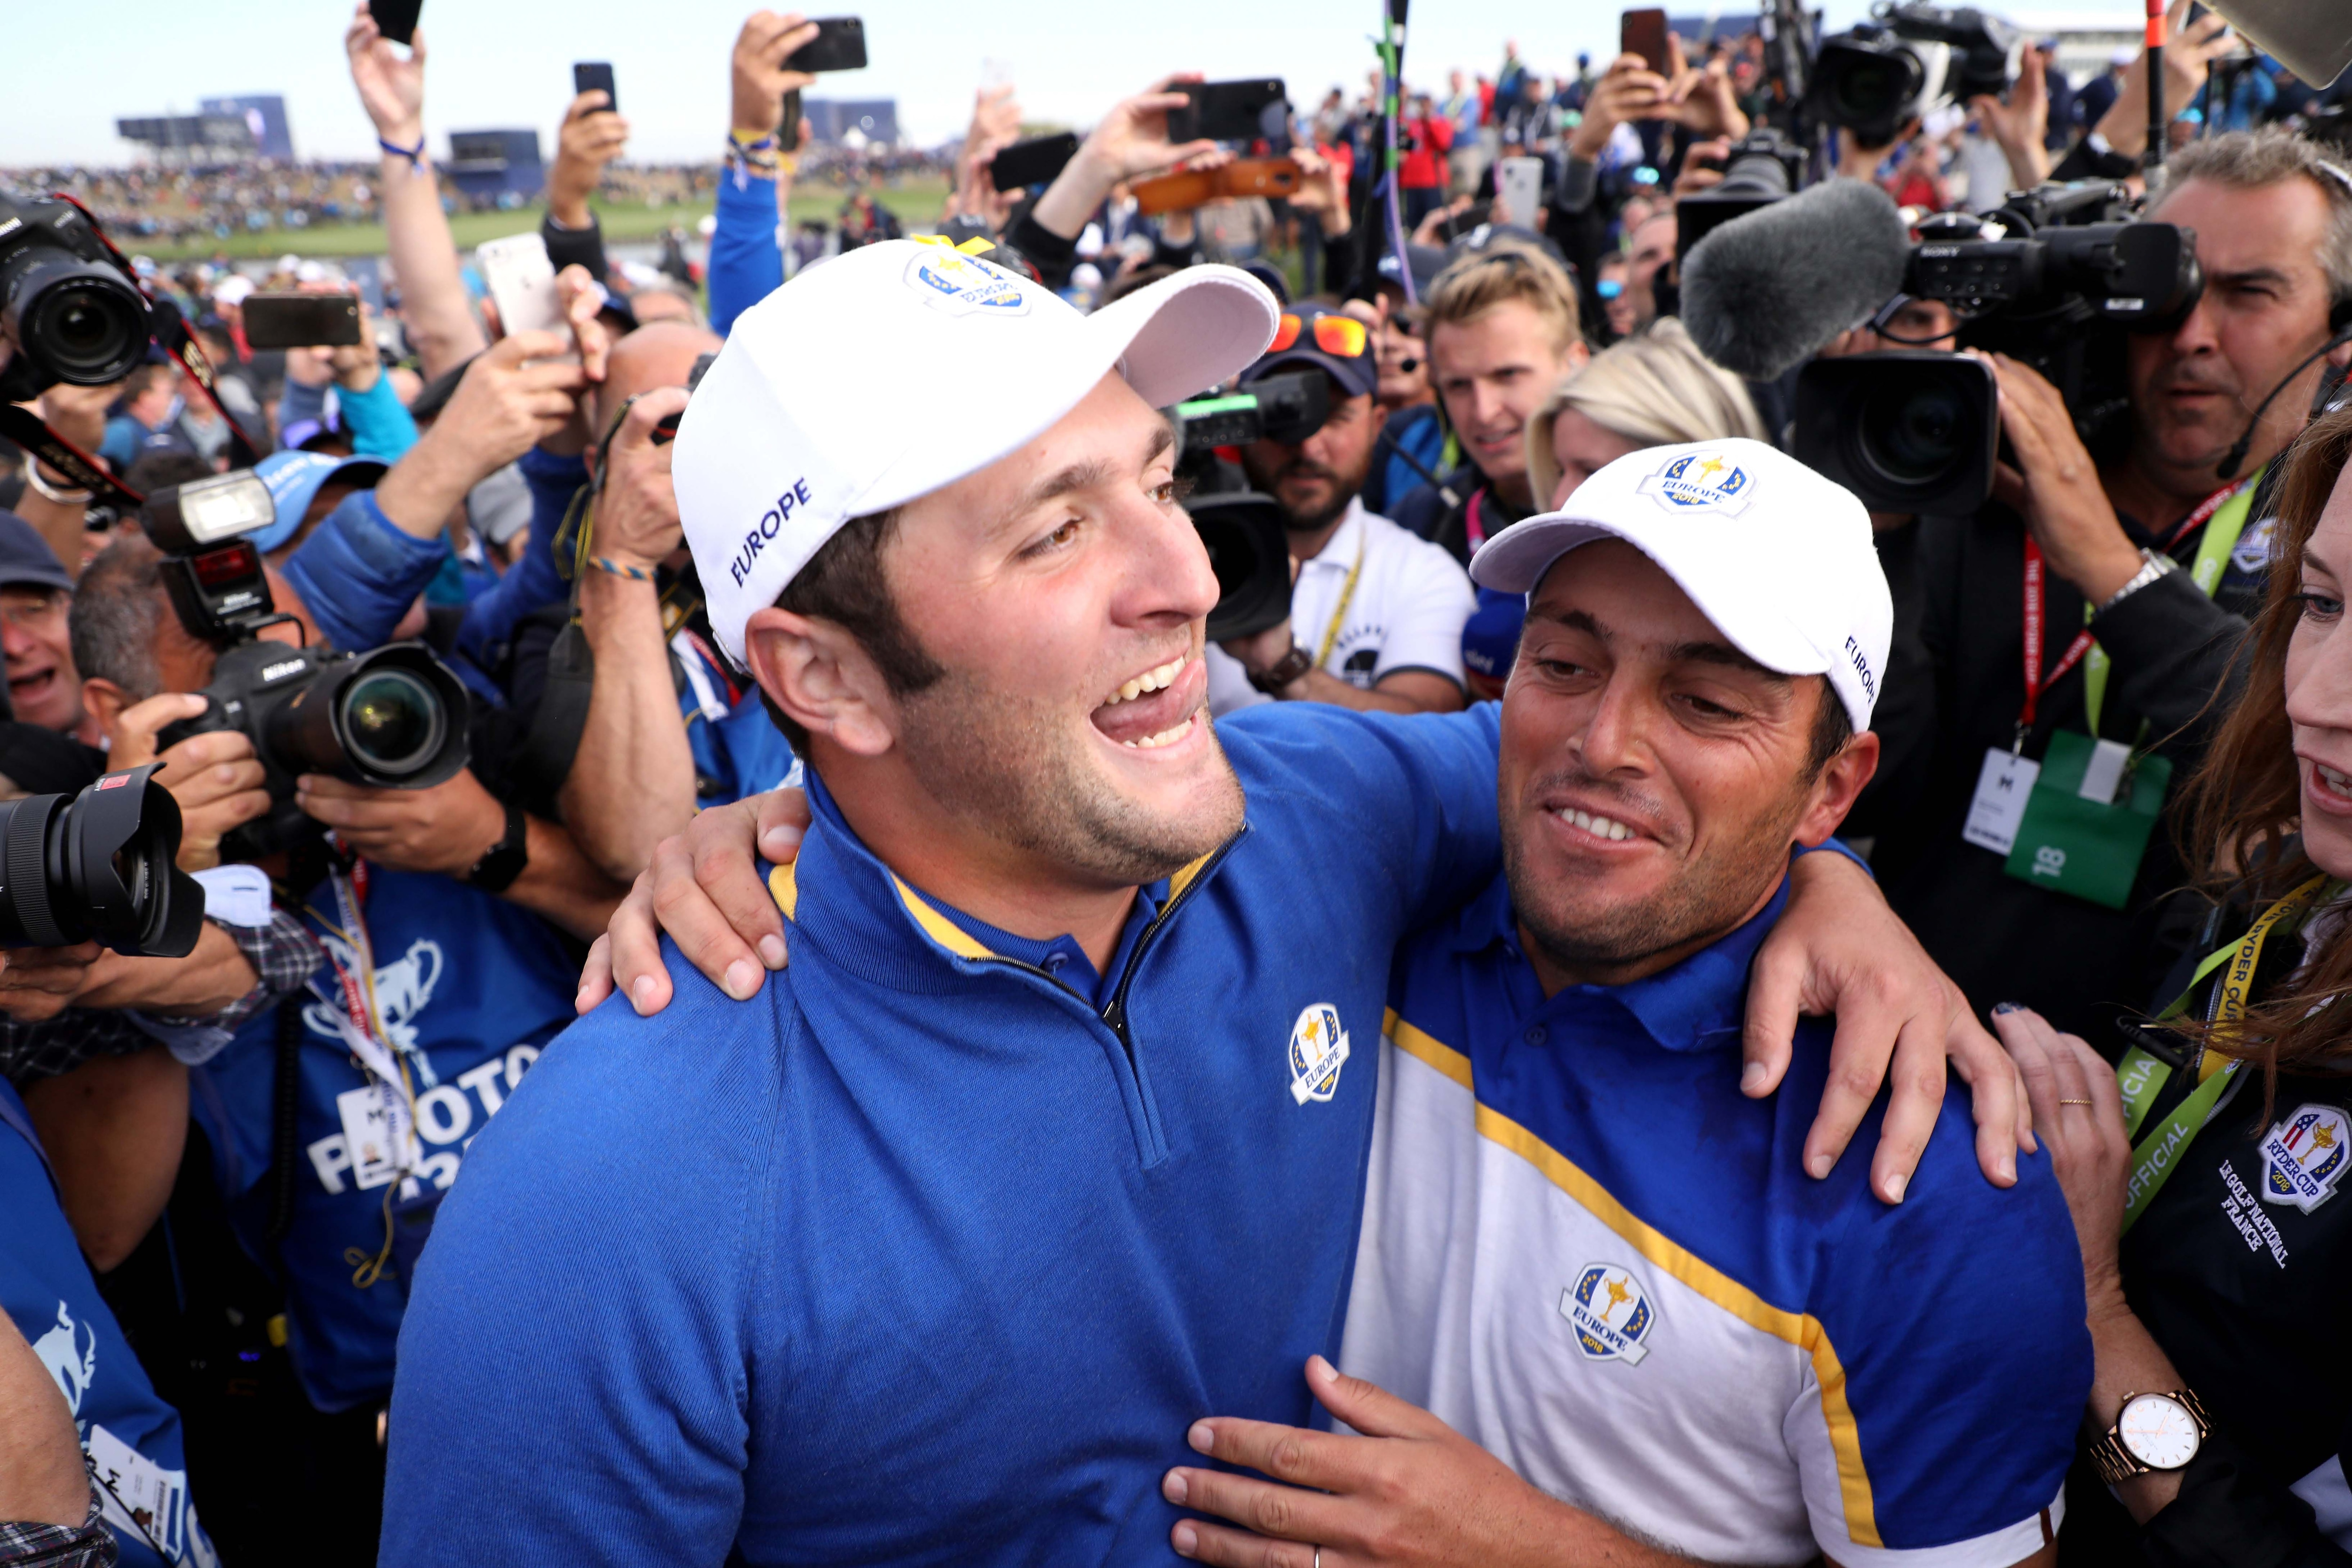 Jon Rahm and Francesco Molinari